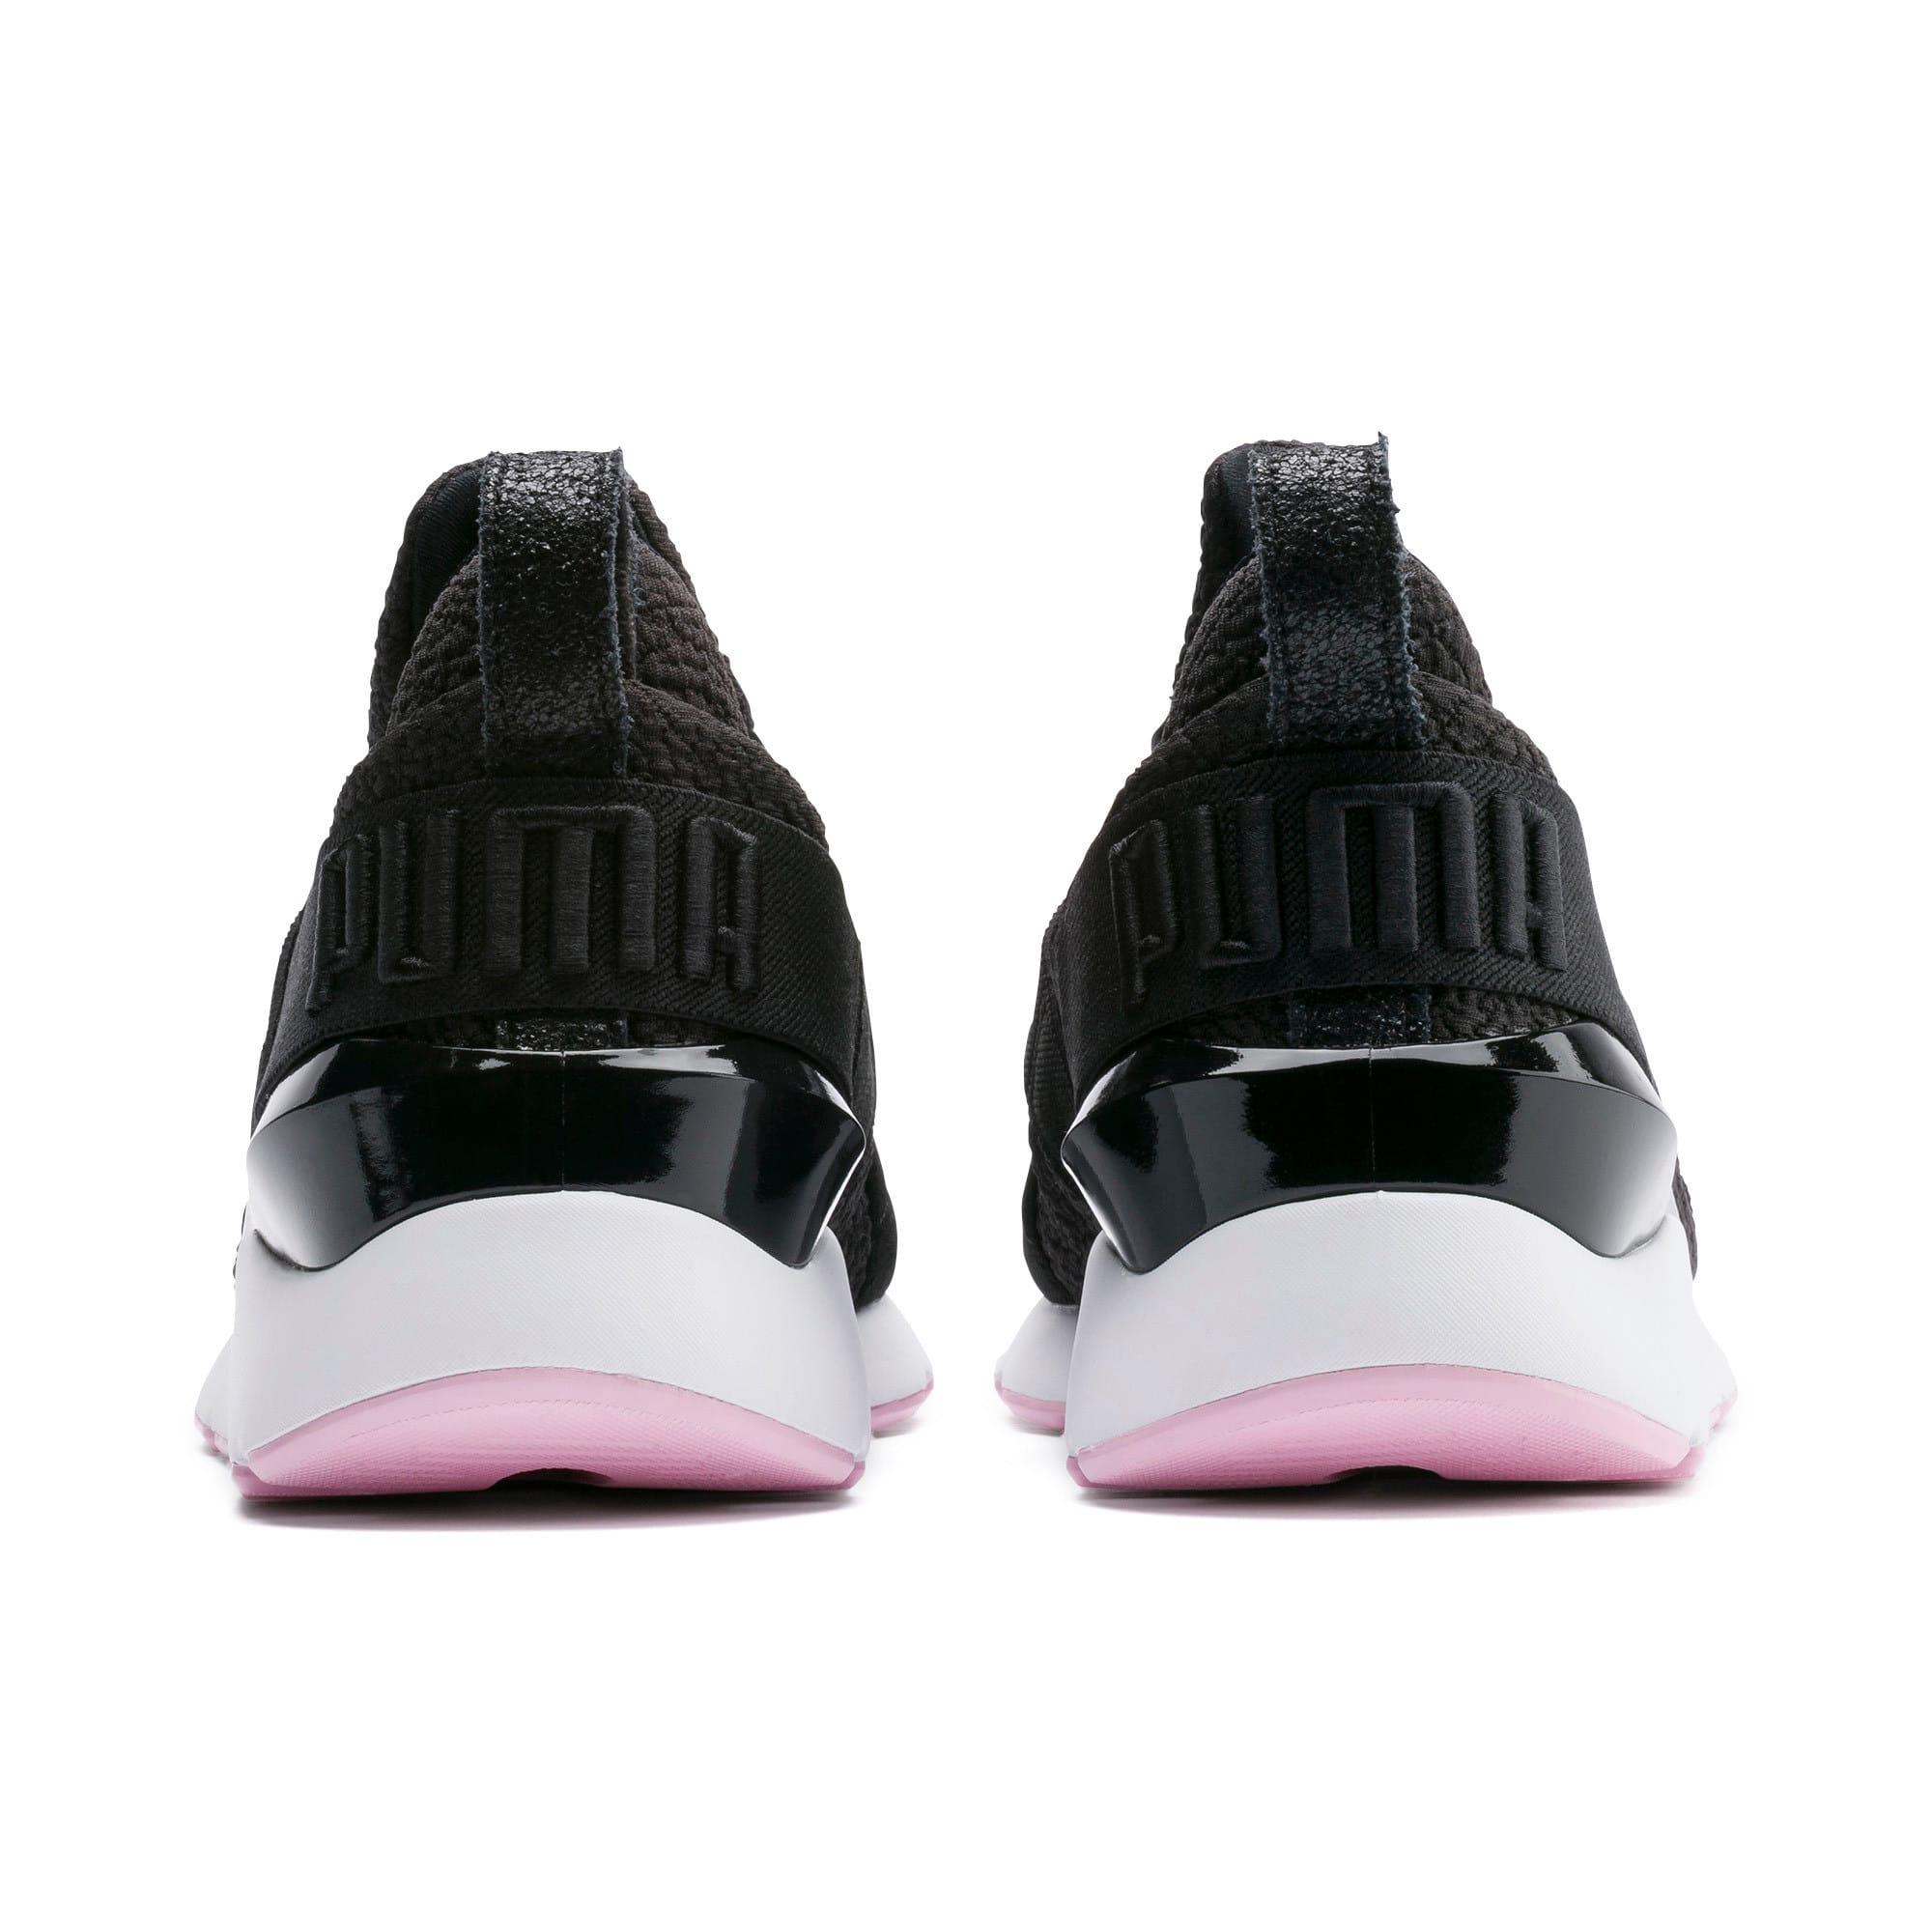 Thumbnail 3 of Muse TZ Damen Sneaker, Puma Black-Pale Pink, medium